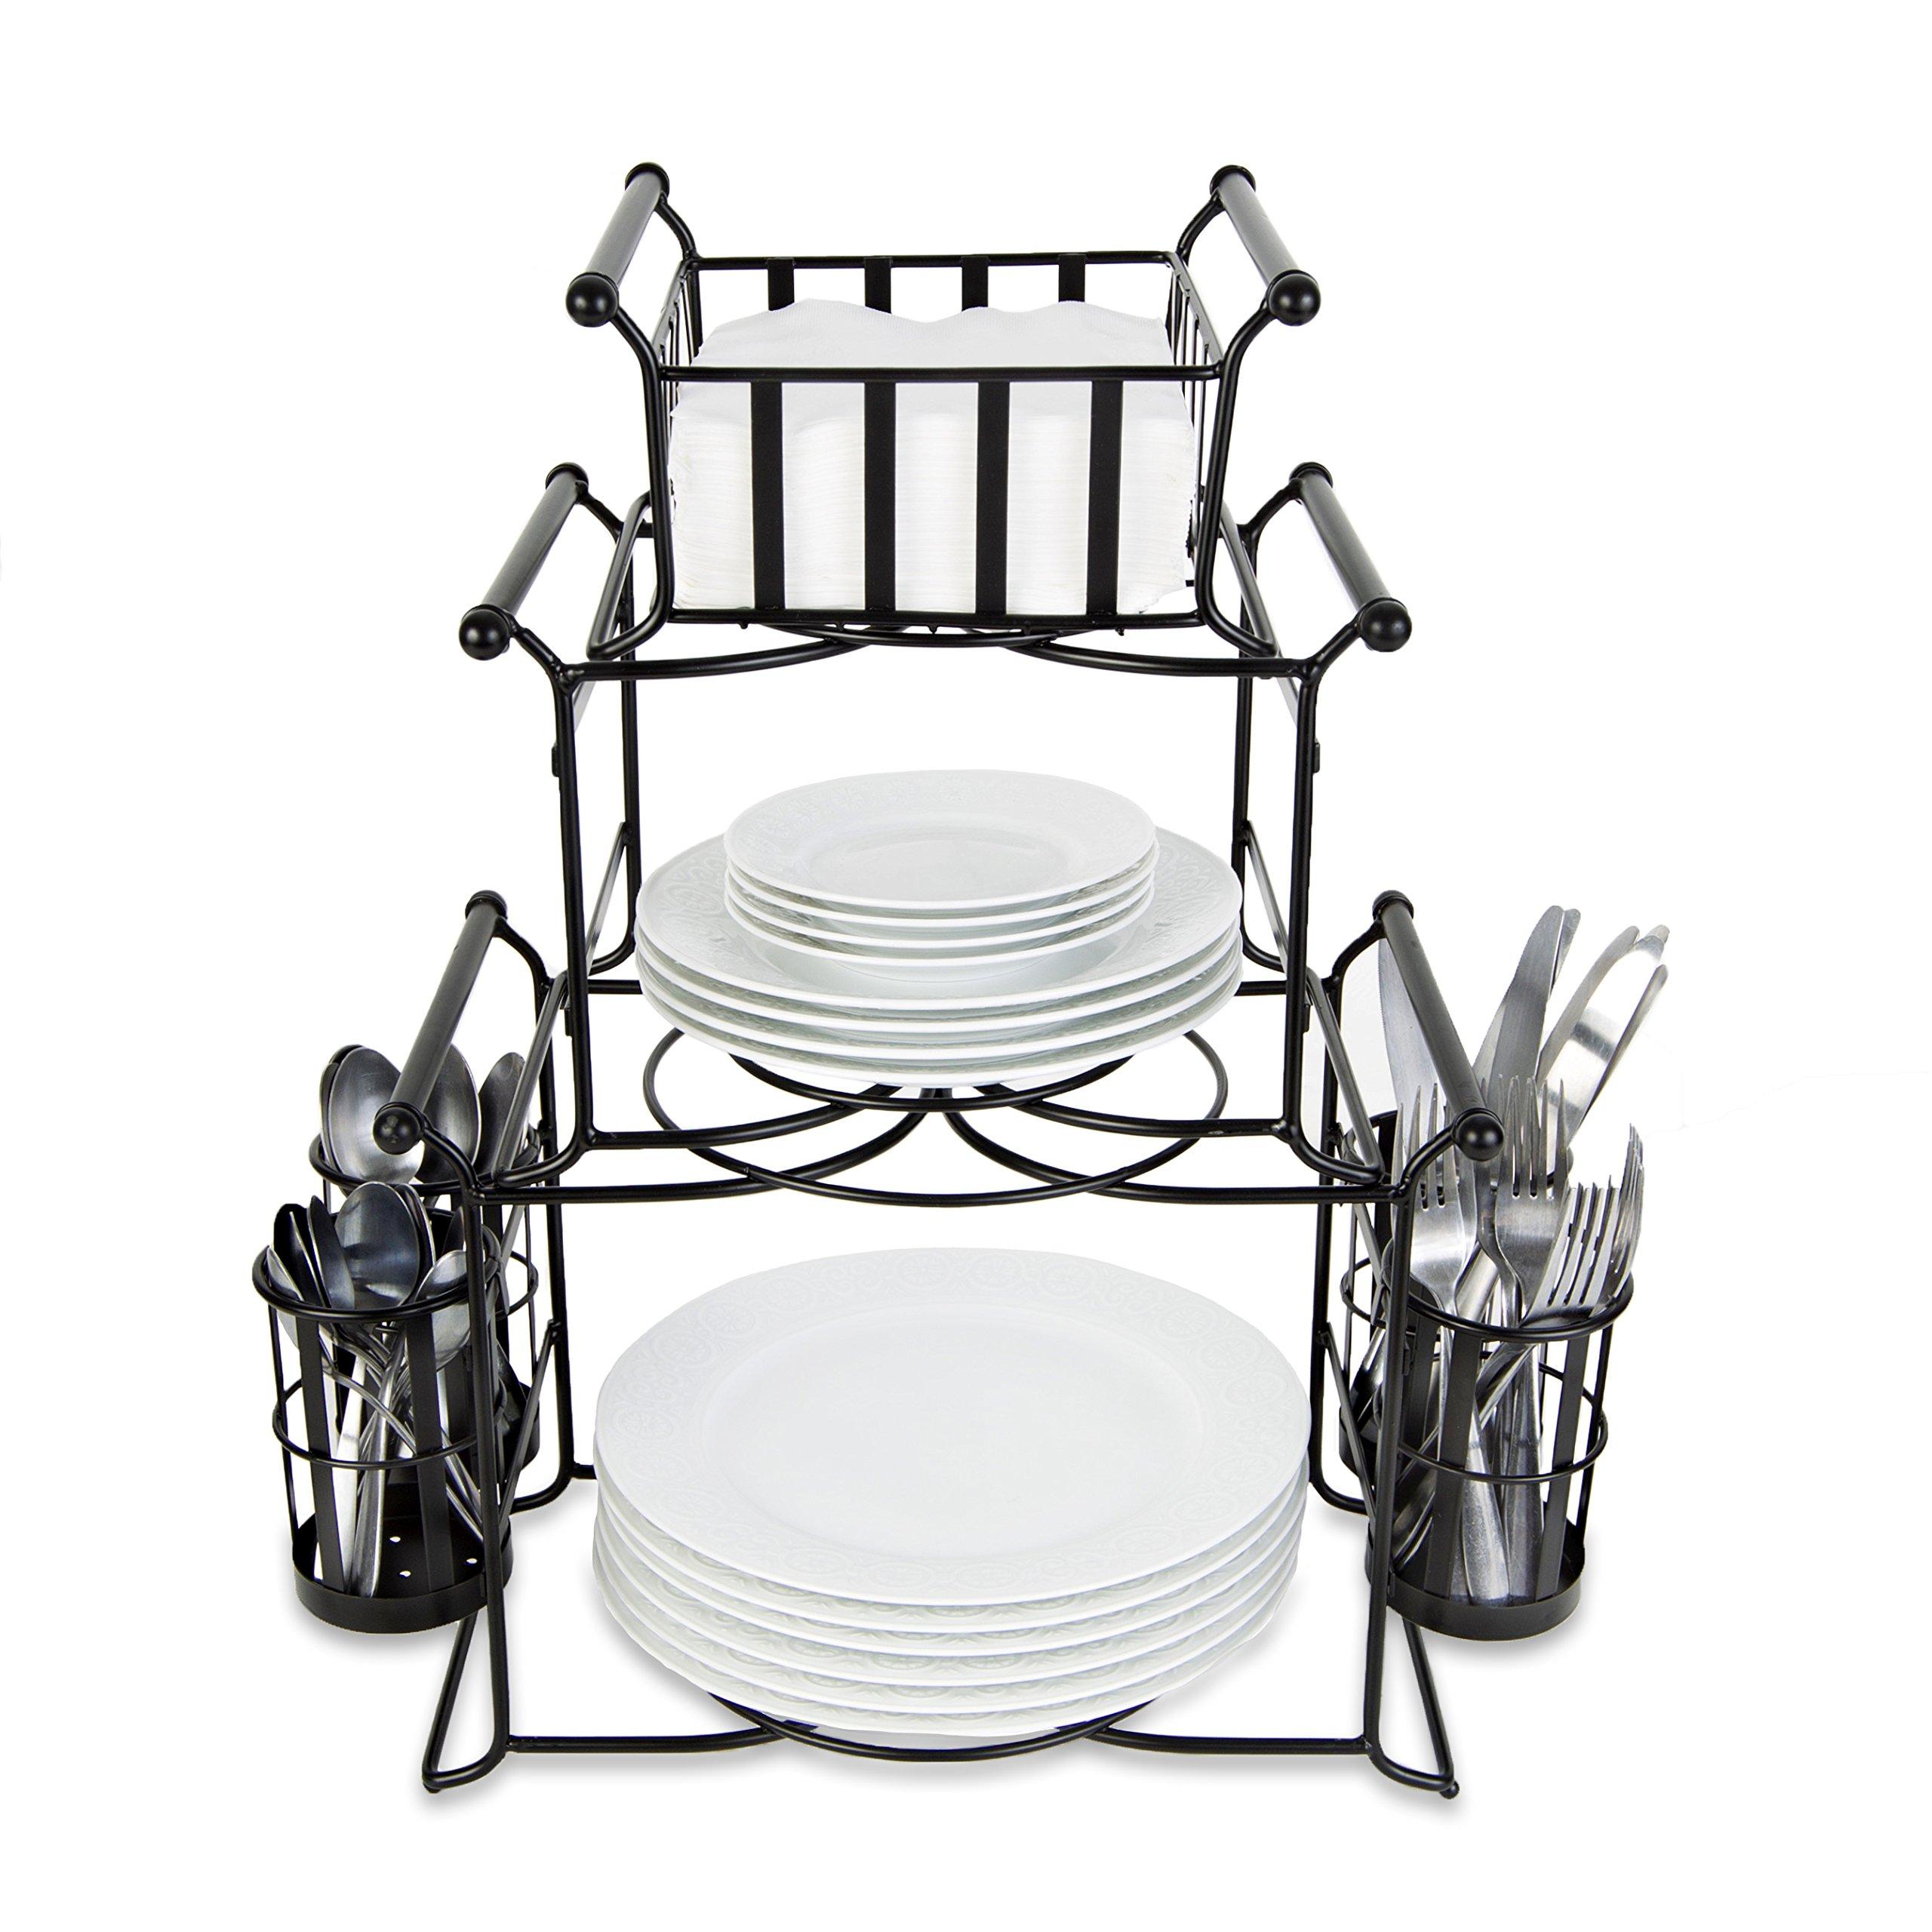 BisonHome Stackable Buffet Caddy Organizer (7-Piece Set) Modern Server for Hosting Parties, Serving Dinner, Carrying Utensils | Metal, Modular Design | Compact, Portable